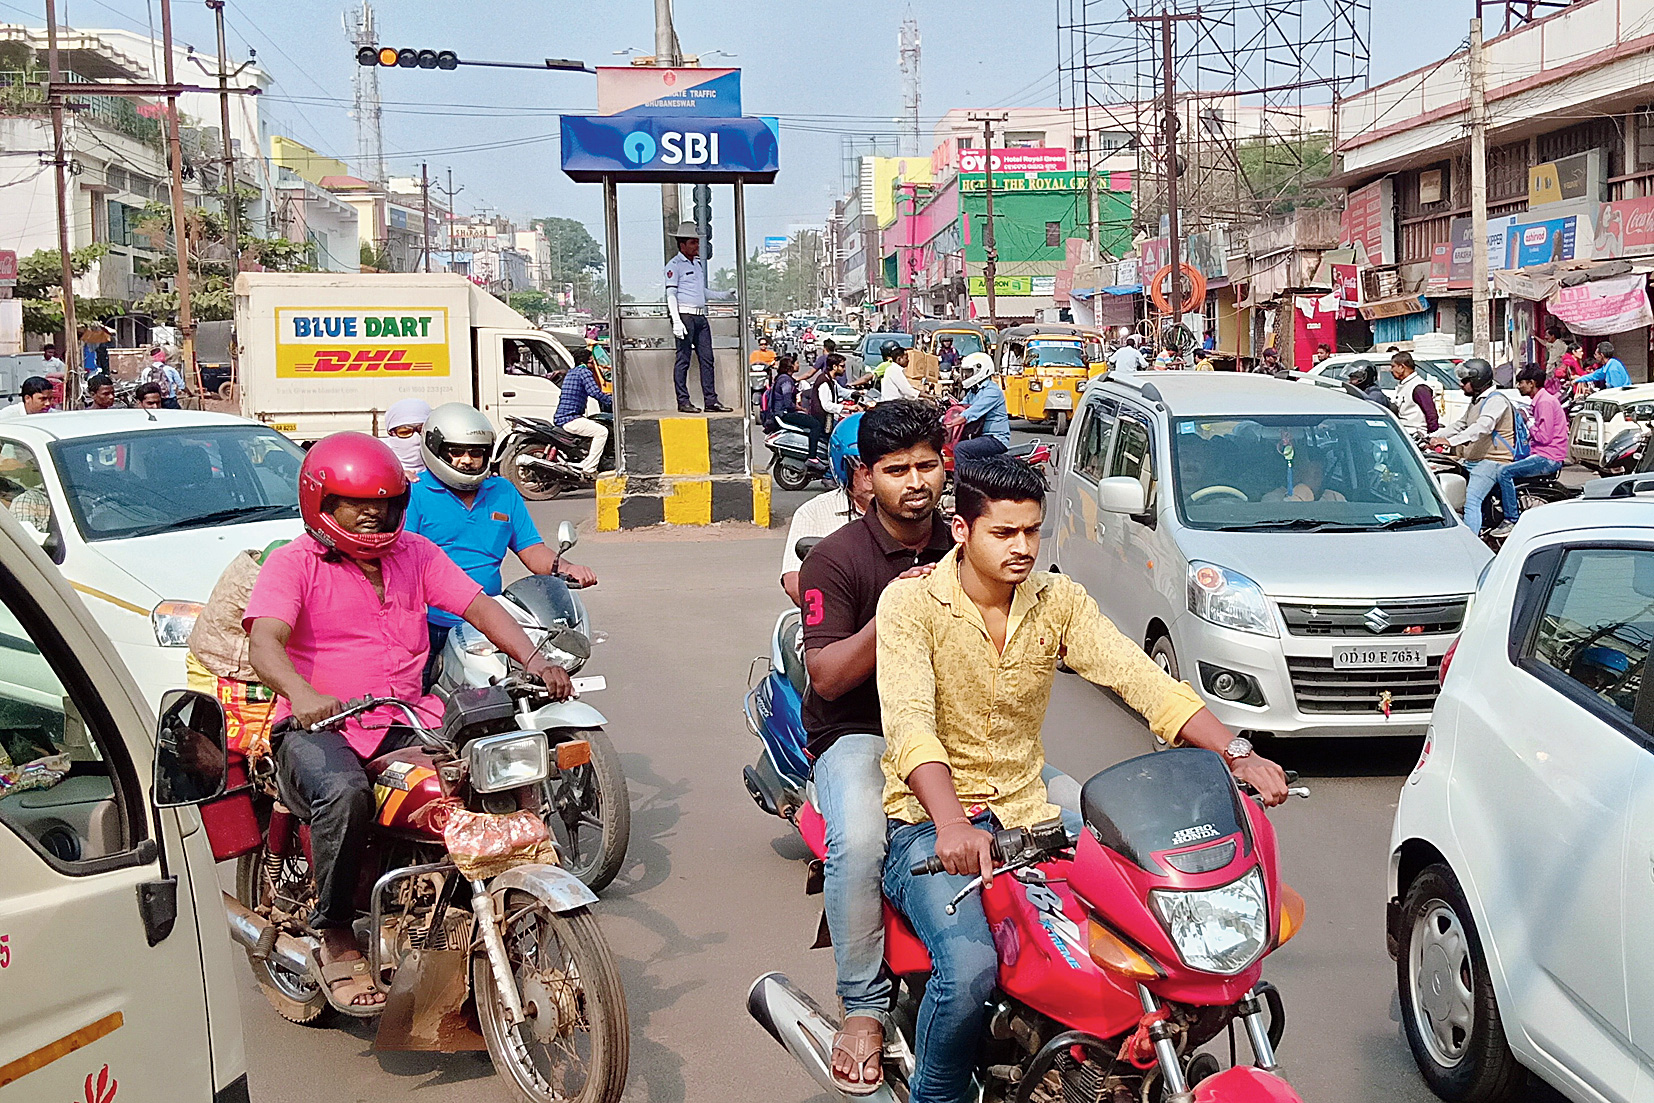 Motorists negotiate busy traffic at Ravi Talkies Square in Bhubaneswar.